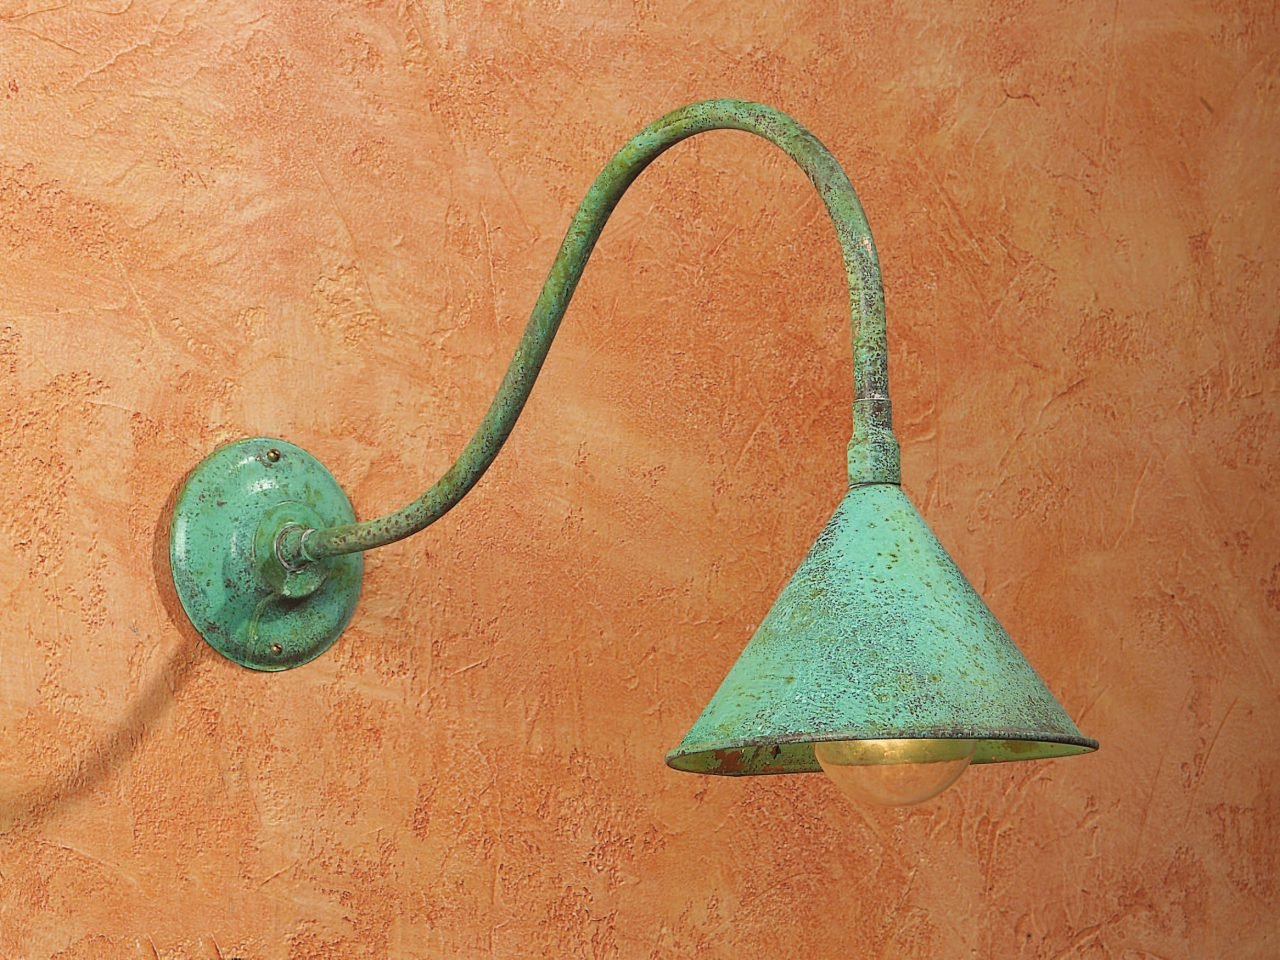 Gooseneck Style Lighting SLS506 Handmade In Solid Copper With Verdigris Finish